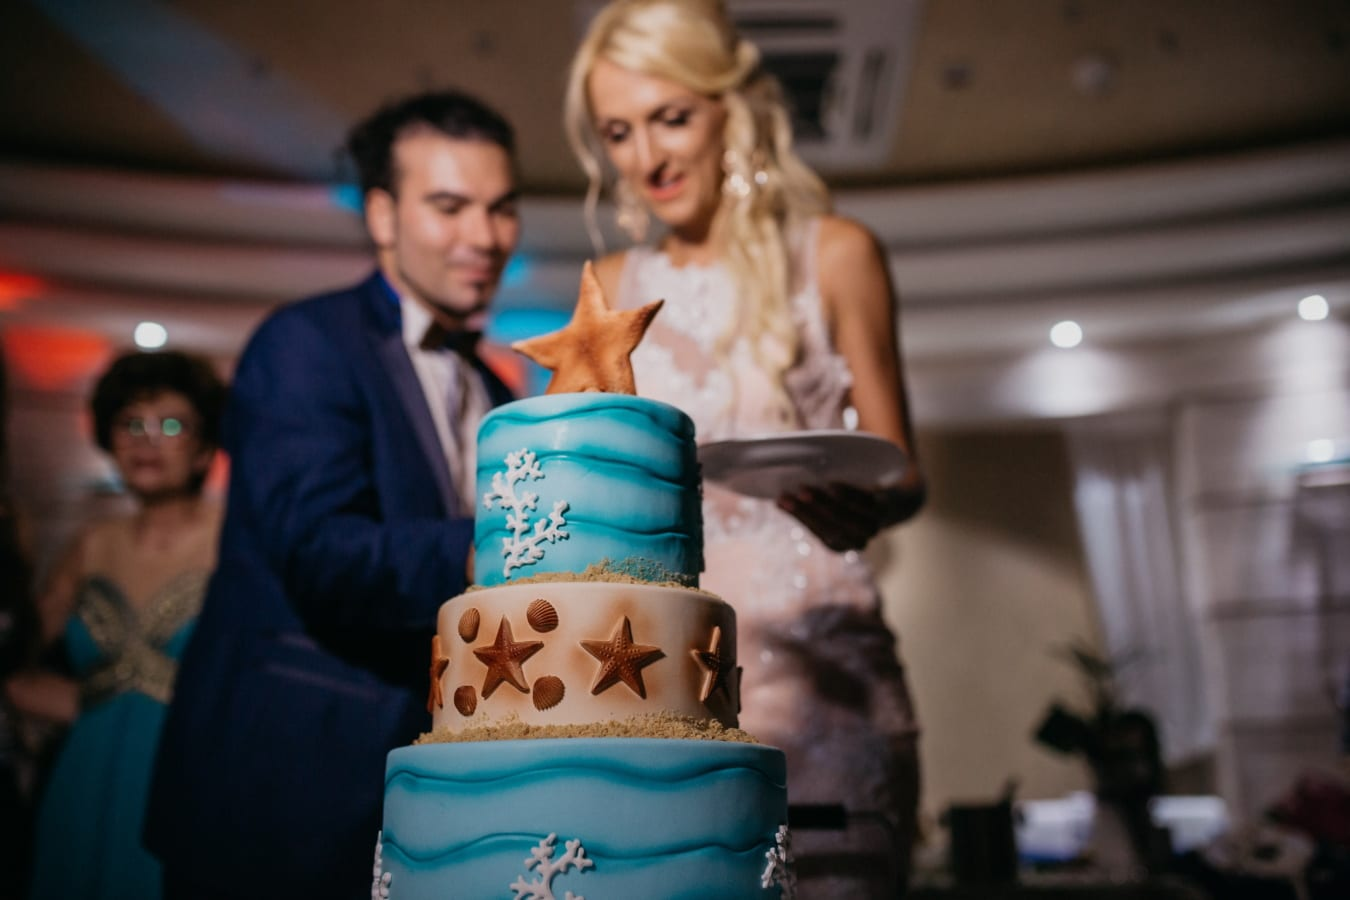 wedding cake, groom, bride, hotel, wedding venue, people, woman, indoors, man, portrait